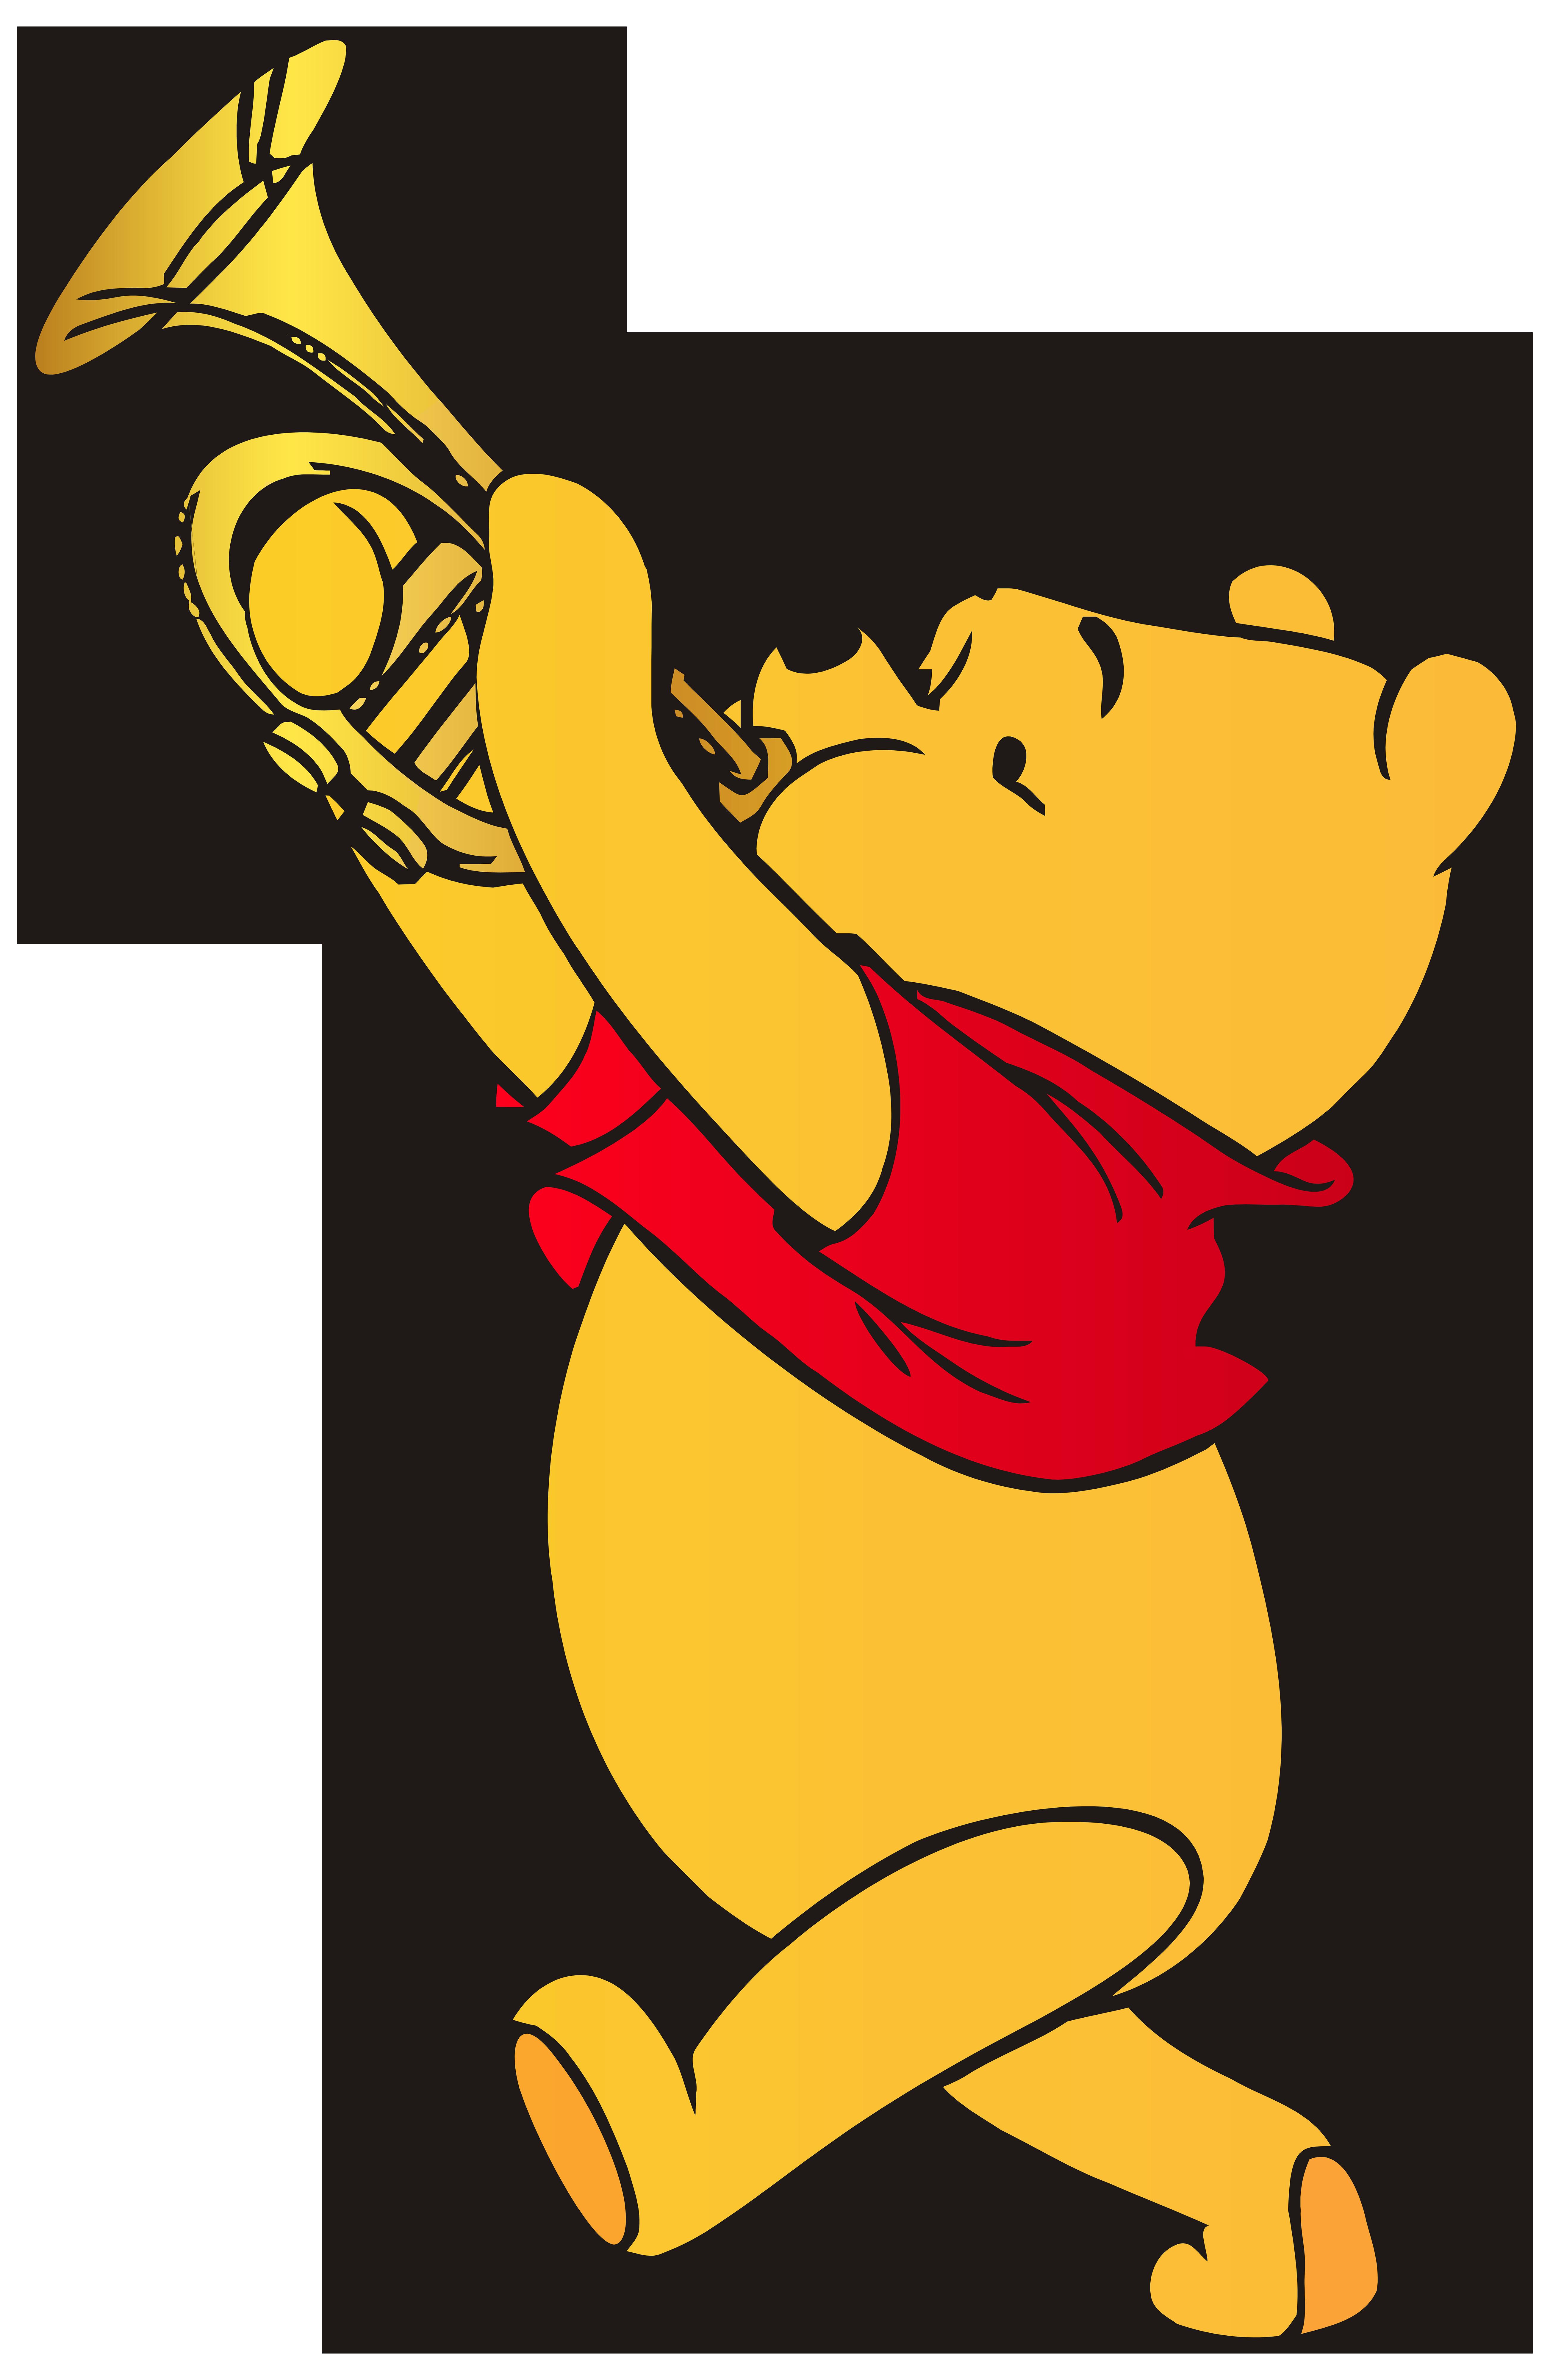 pooh bear clipart at getdrawings com free for personal use pooh rh getdrawings com Disney Winnie the Pooh Clip Art Winnie the Pooh Baby Clip Art